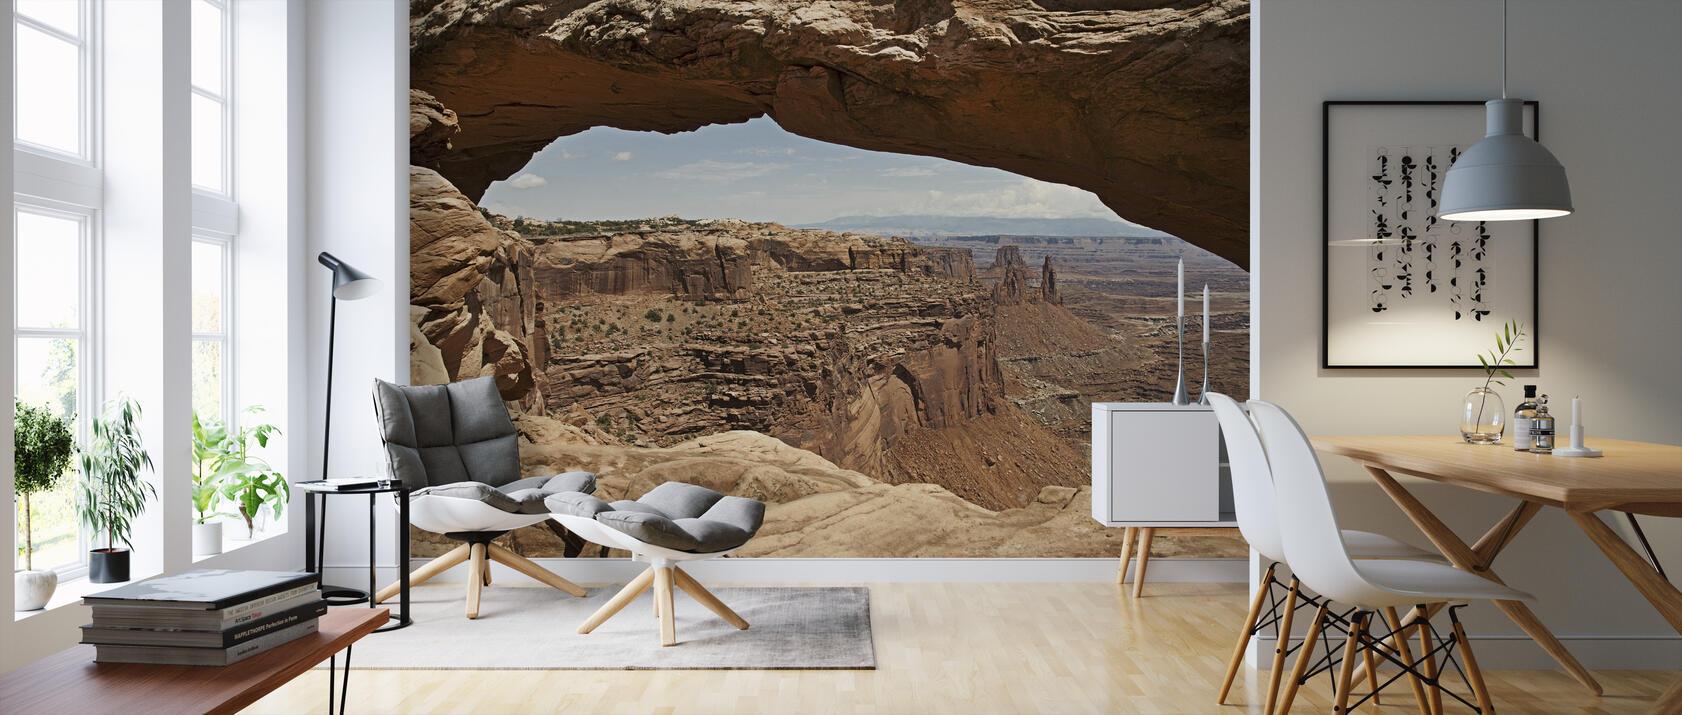 mesa arch fototapete nach ma photowall. Black Bedroom Furniture Sets. Home Design Ideas